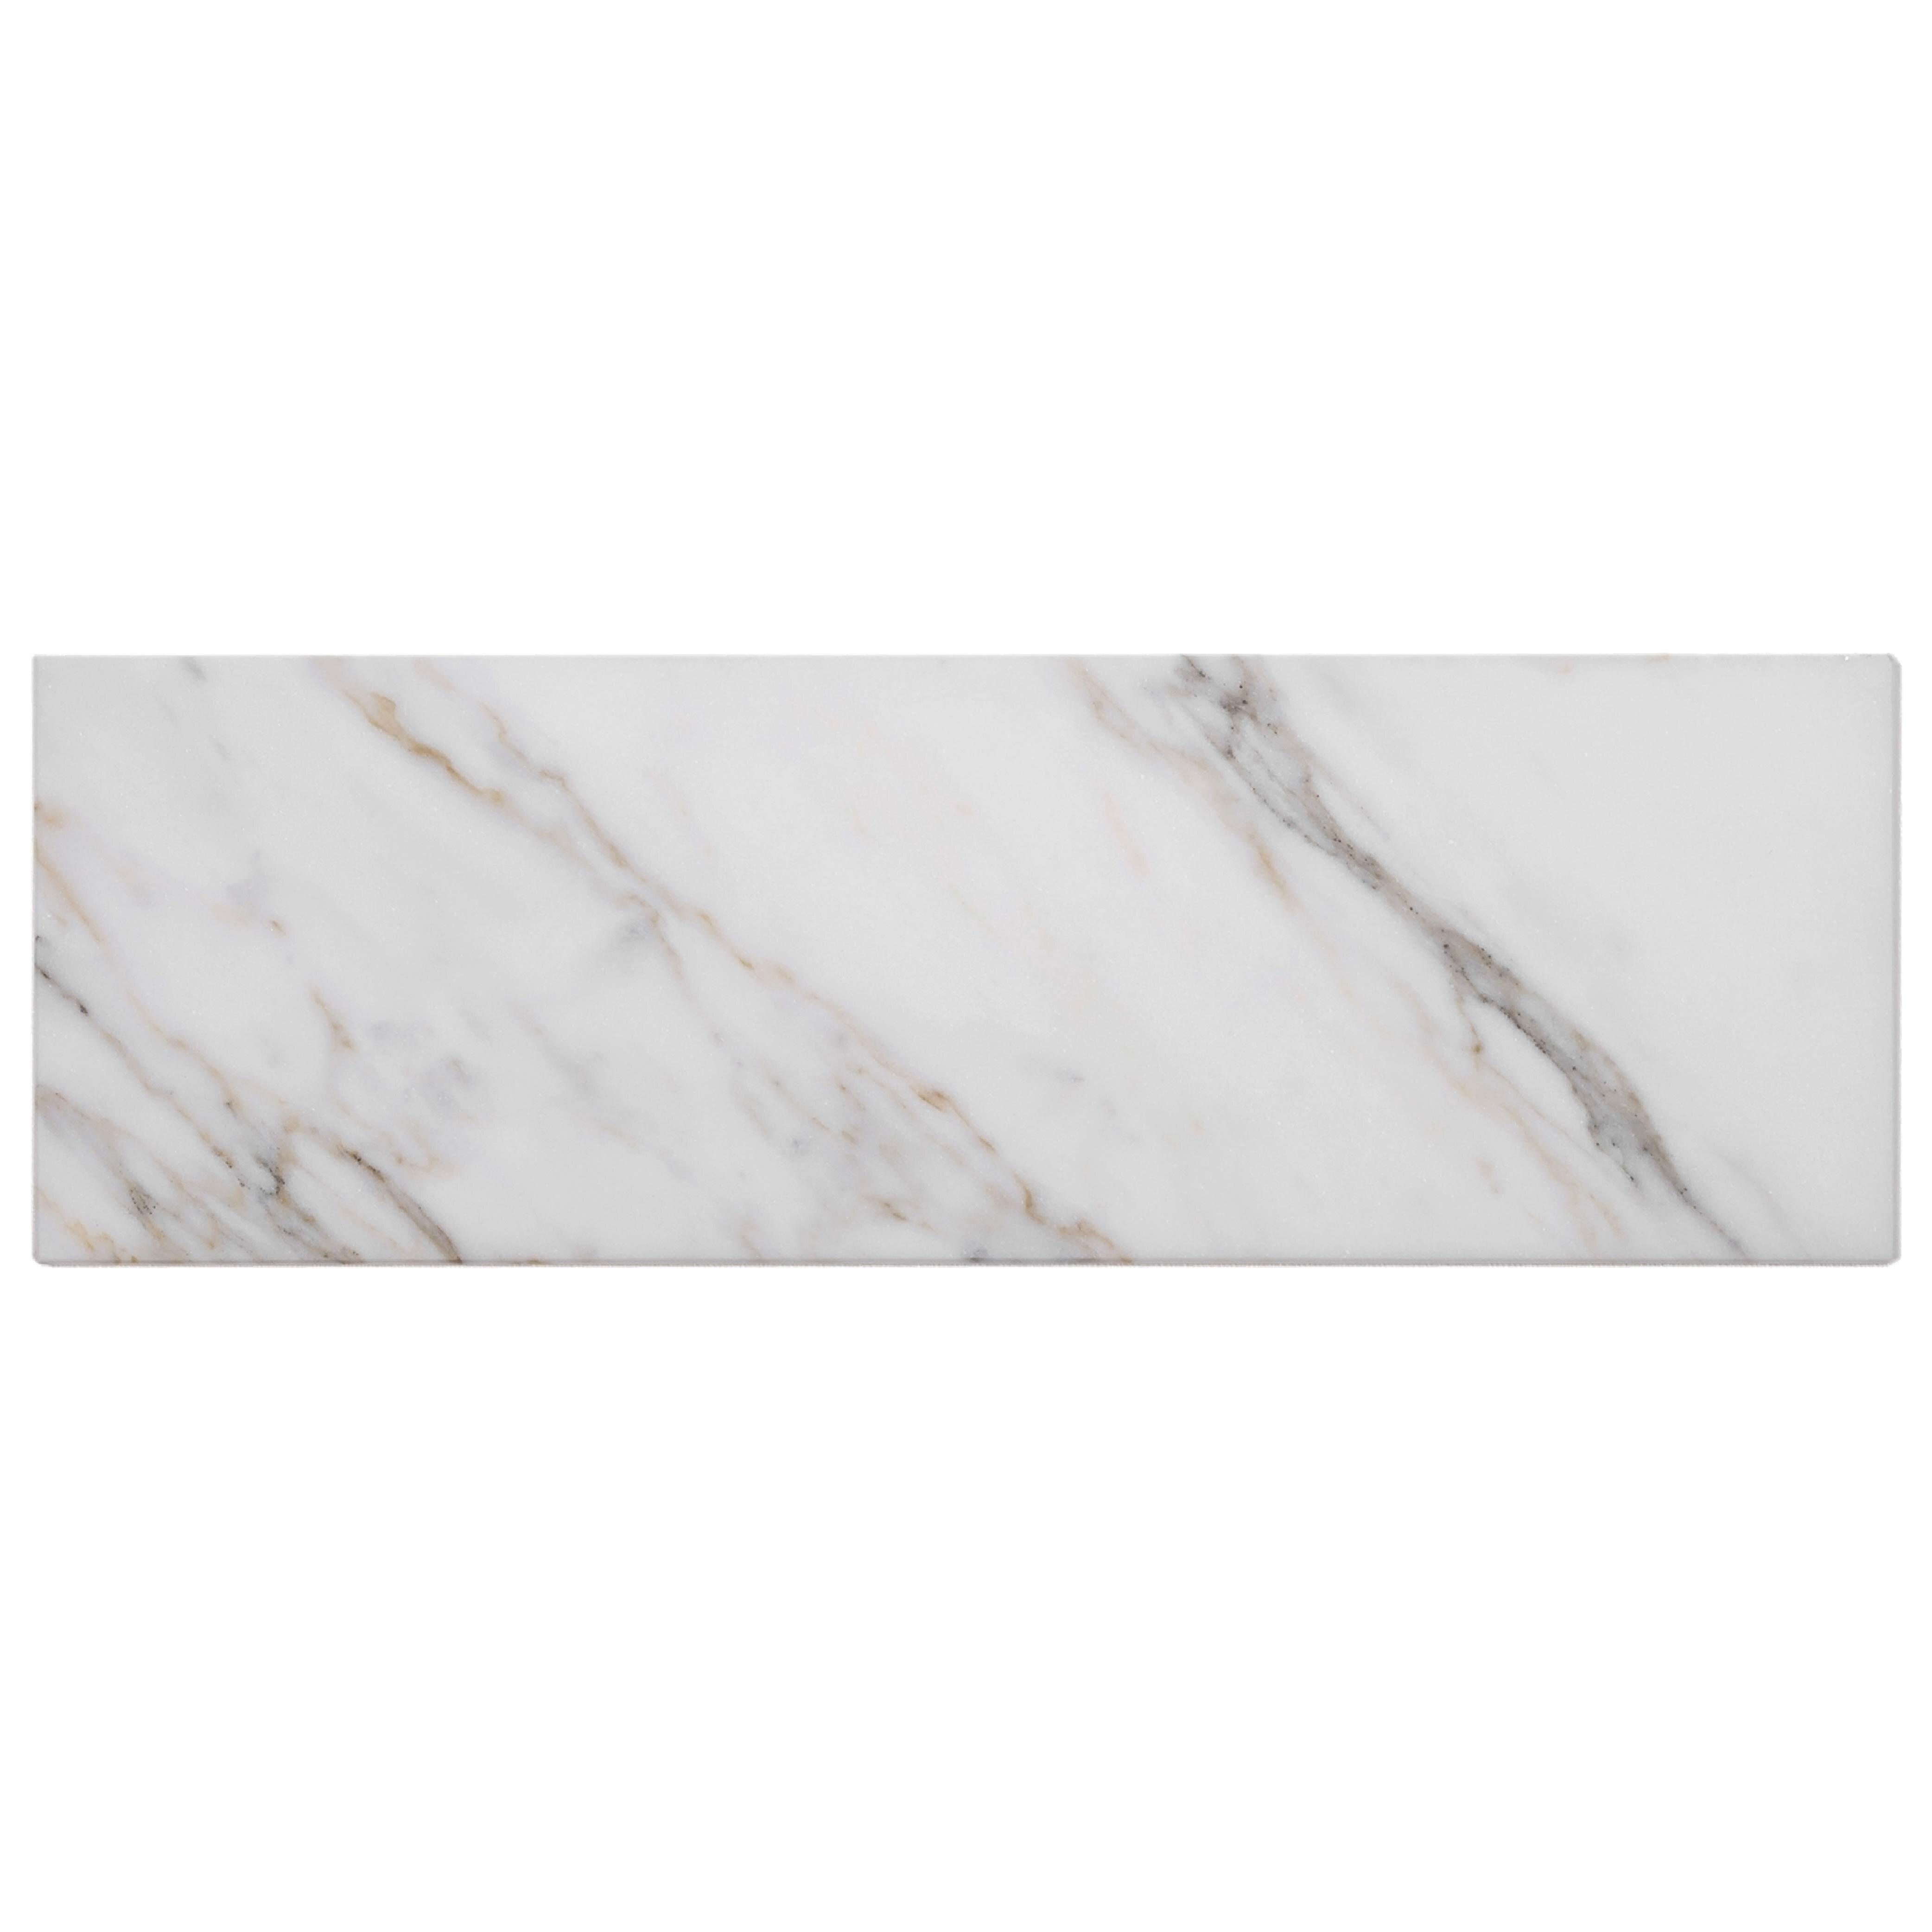 apollo tile backsplash tiles sheet 12 x 4 calacatta gold tile for kitchen bathroom flooring calacatta honed subway white grey 15 pack wayfair